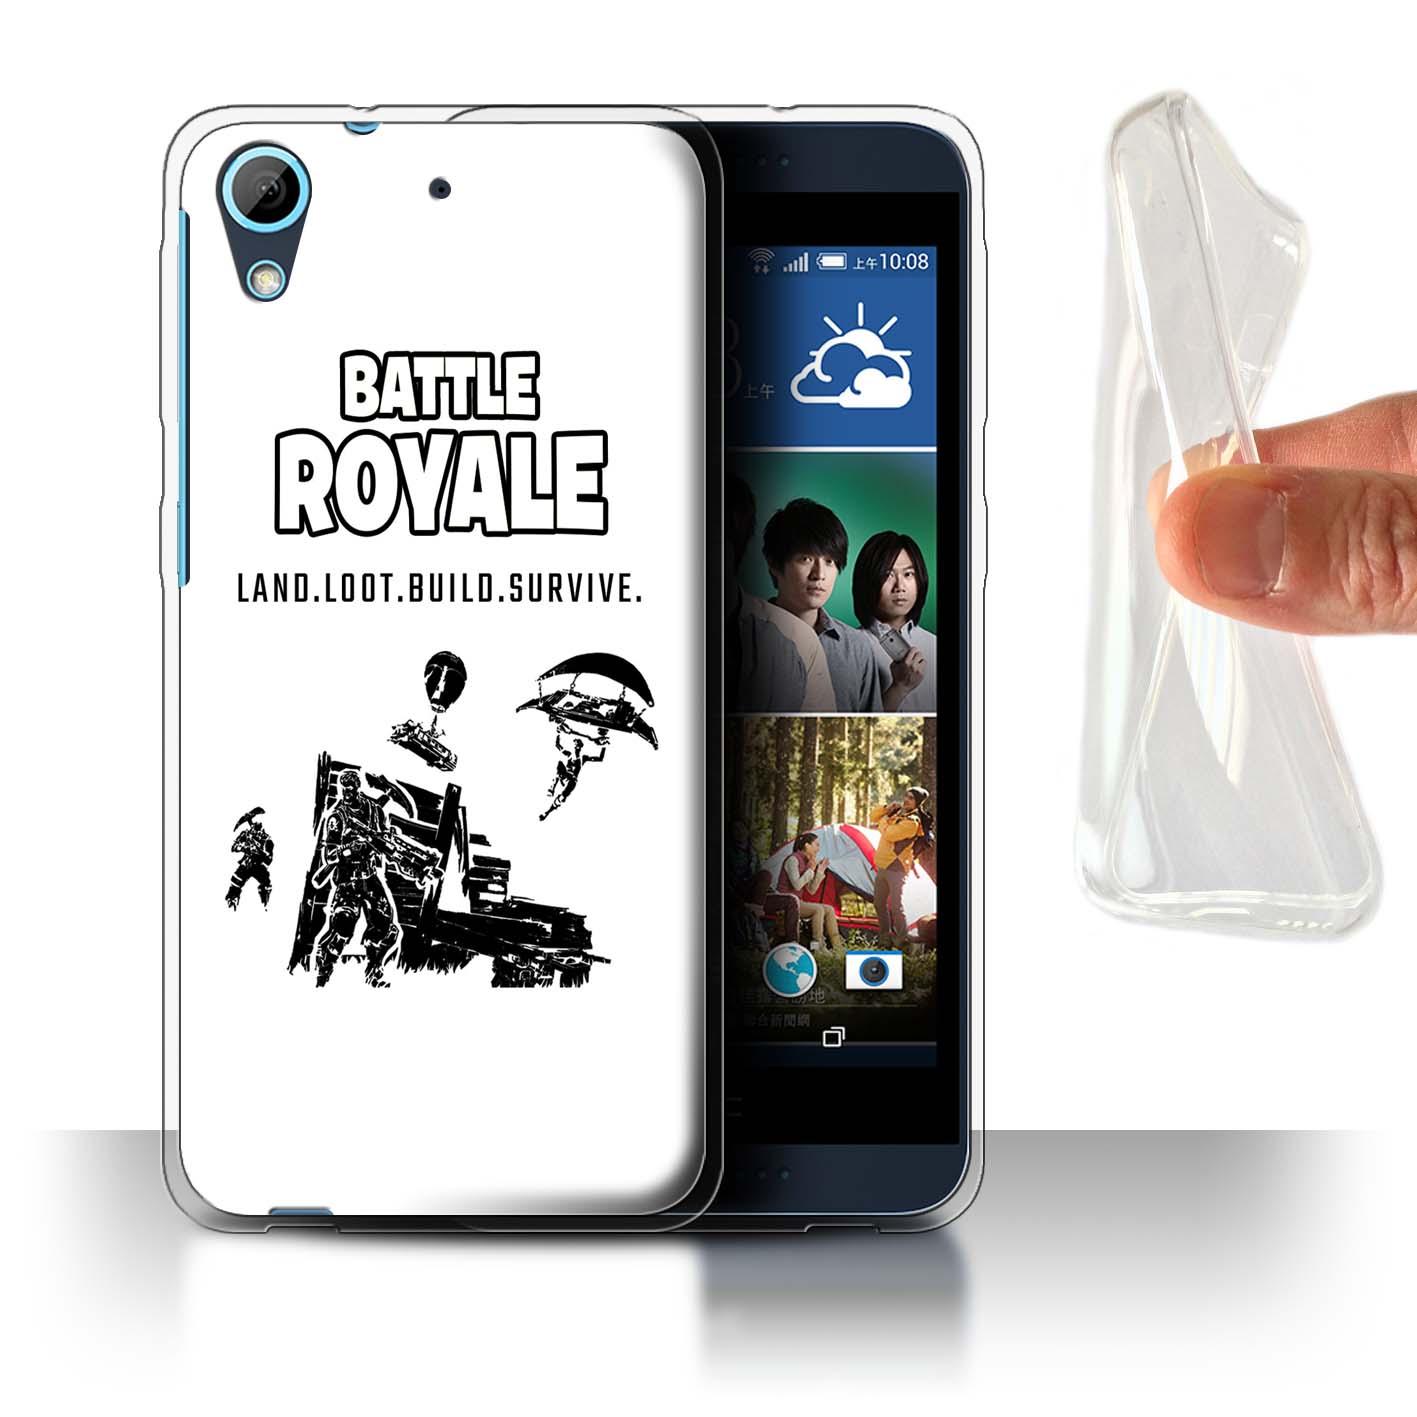 STUFF4-Gel-TPU-Phone-Case-for-HTC-Desire-626-FN-Battle-Royale